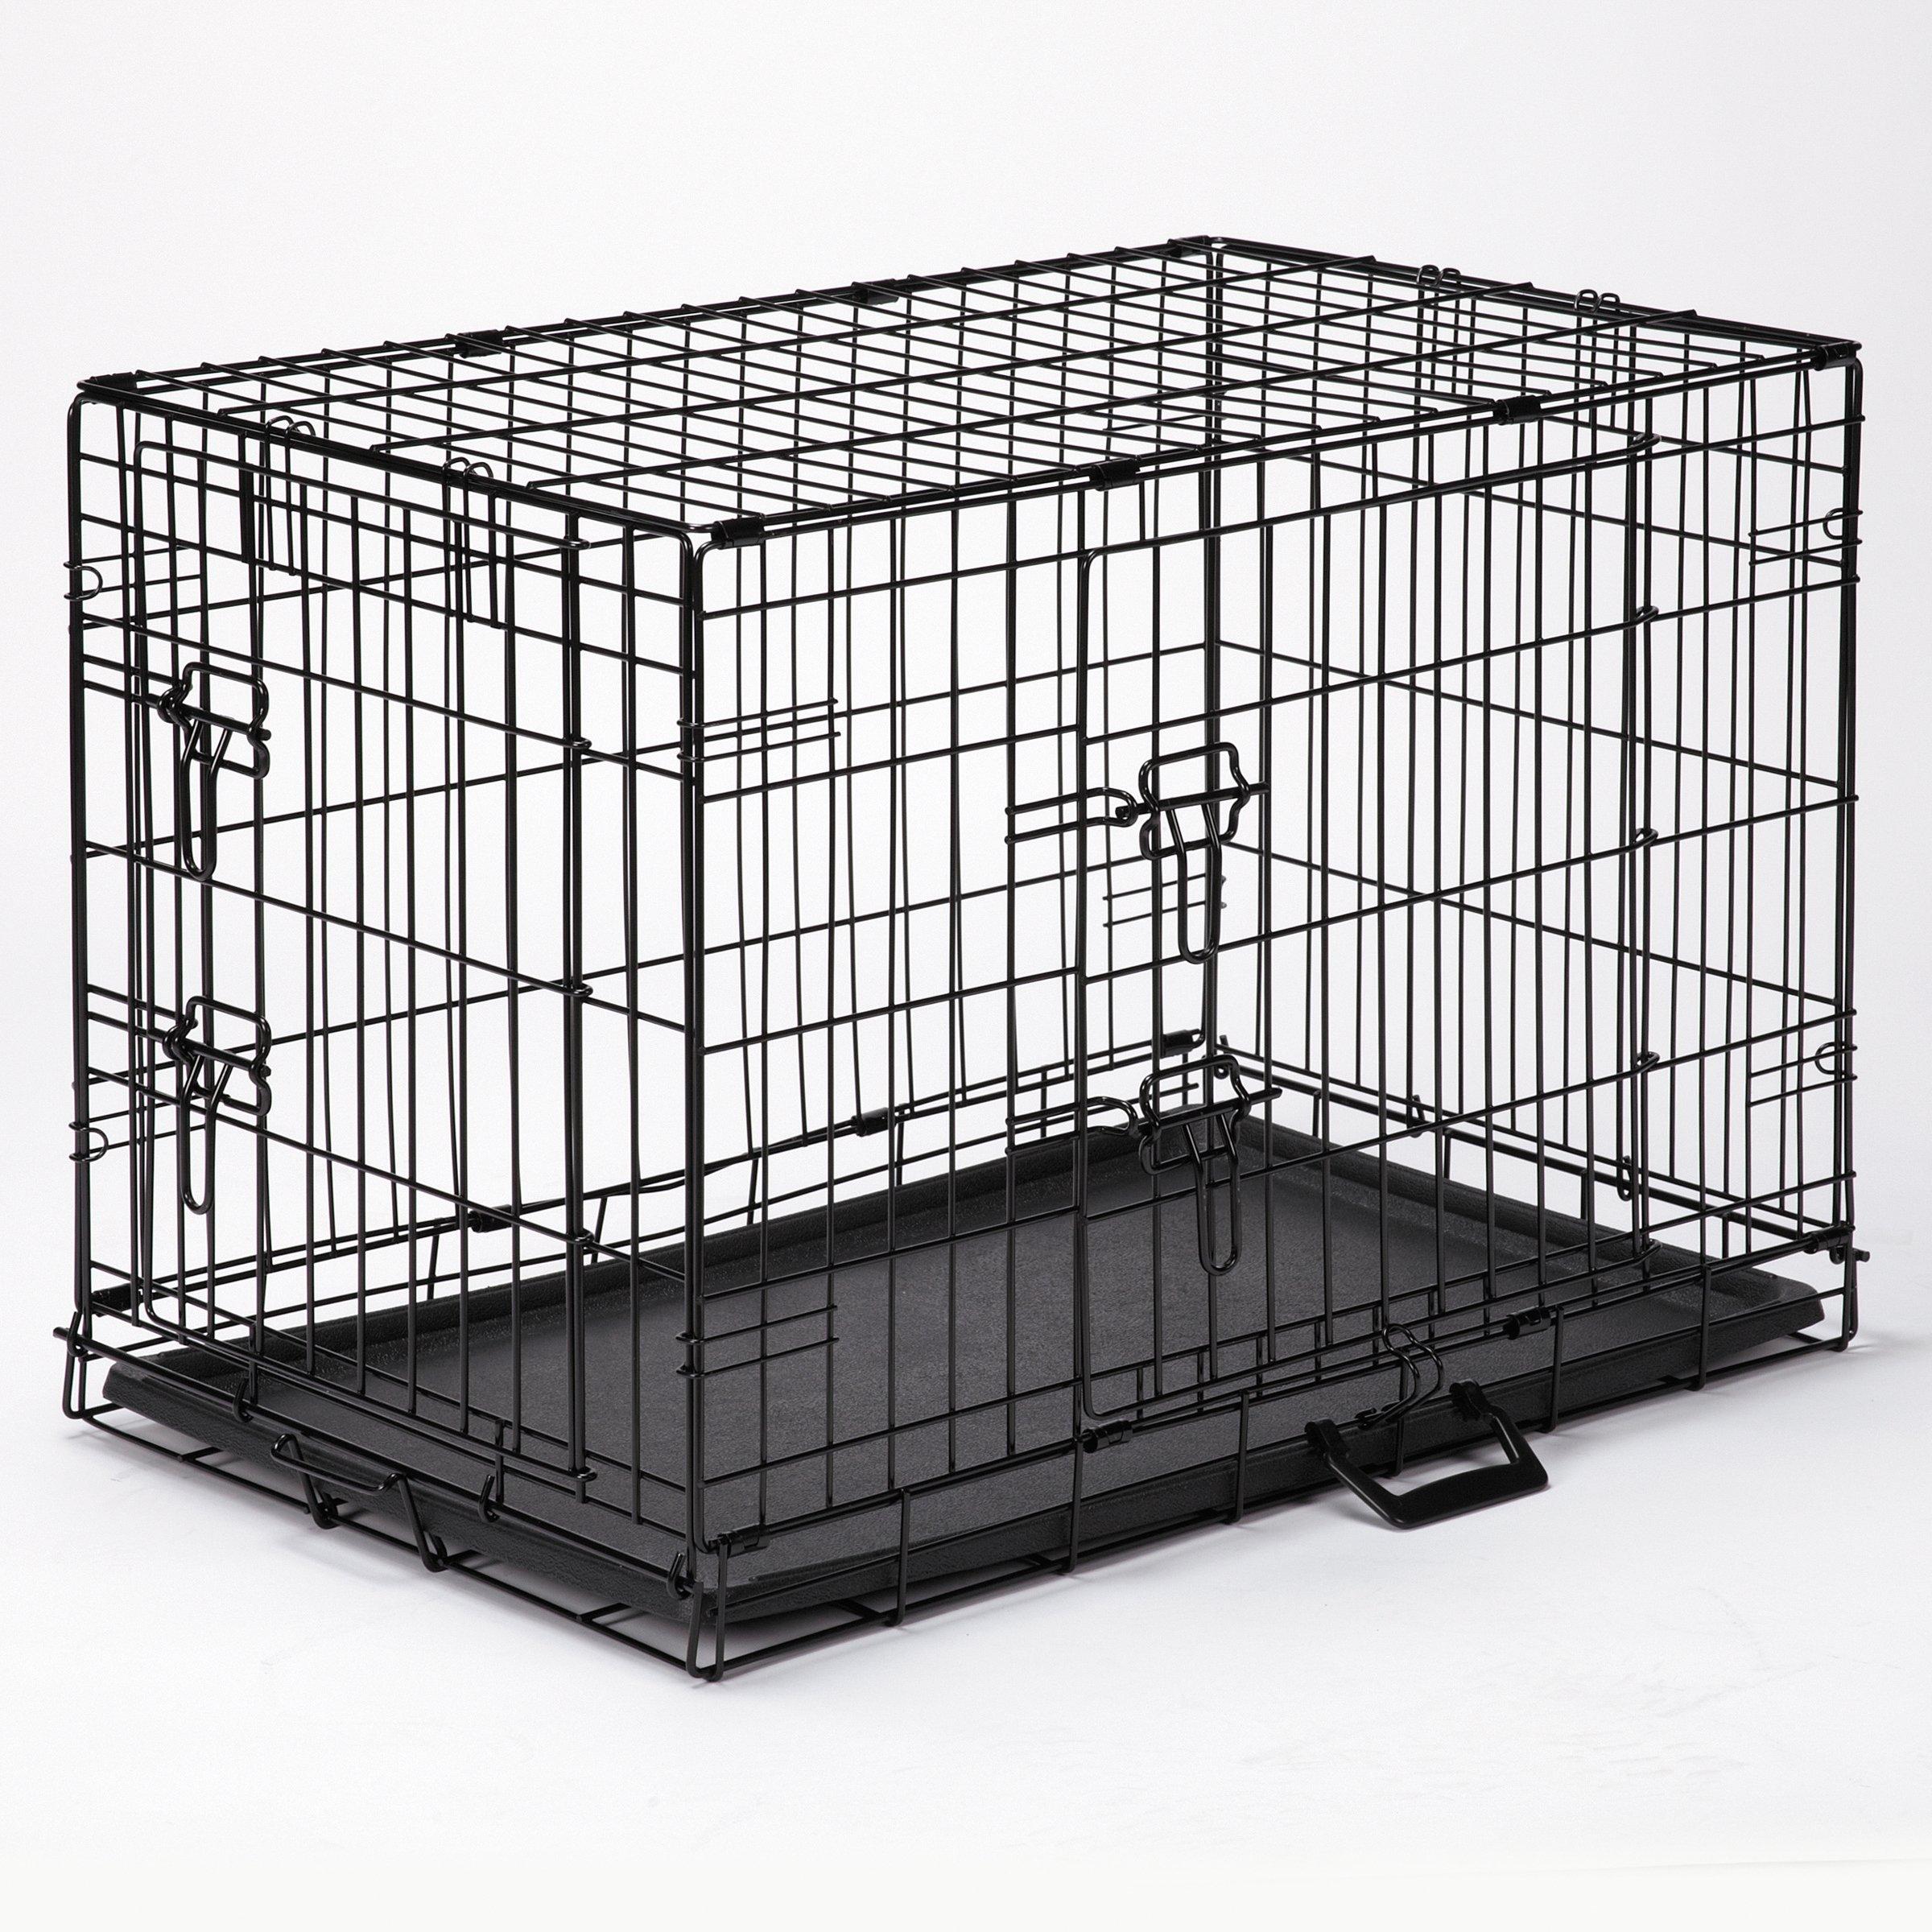 Easy Dog Crates - Black; X-Small, 18''L x 12½''W x 15''H, Small, 24''L x 17''W x 20''H, Med., 30''L x 19''W x 22''H; Med./Large, 36''L x 22½''W x 25''H; Large, 42''L x 28''W x 31''H; X-Large, 48''L x 30''W x 33''H